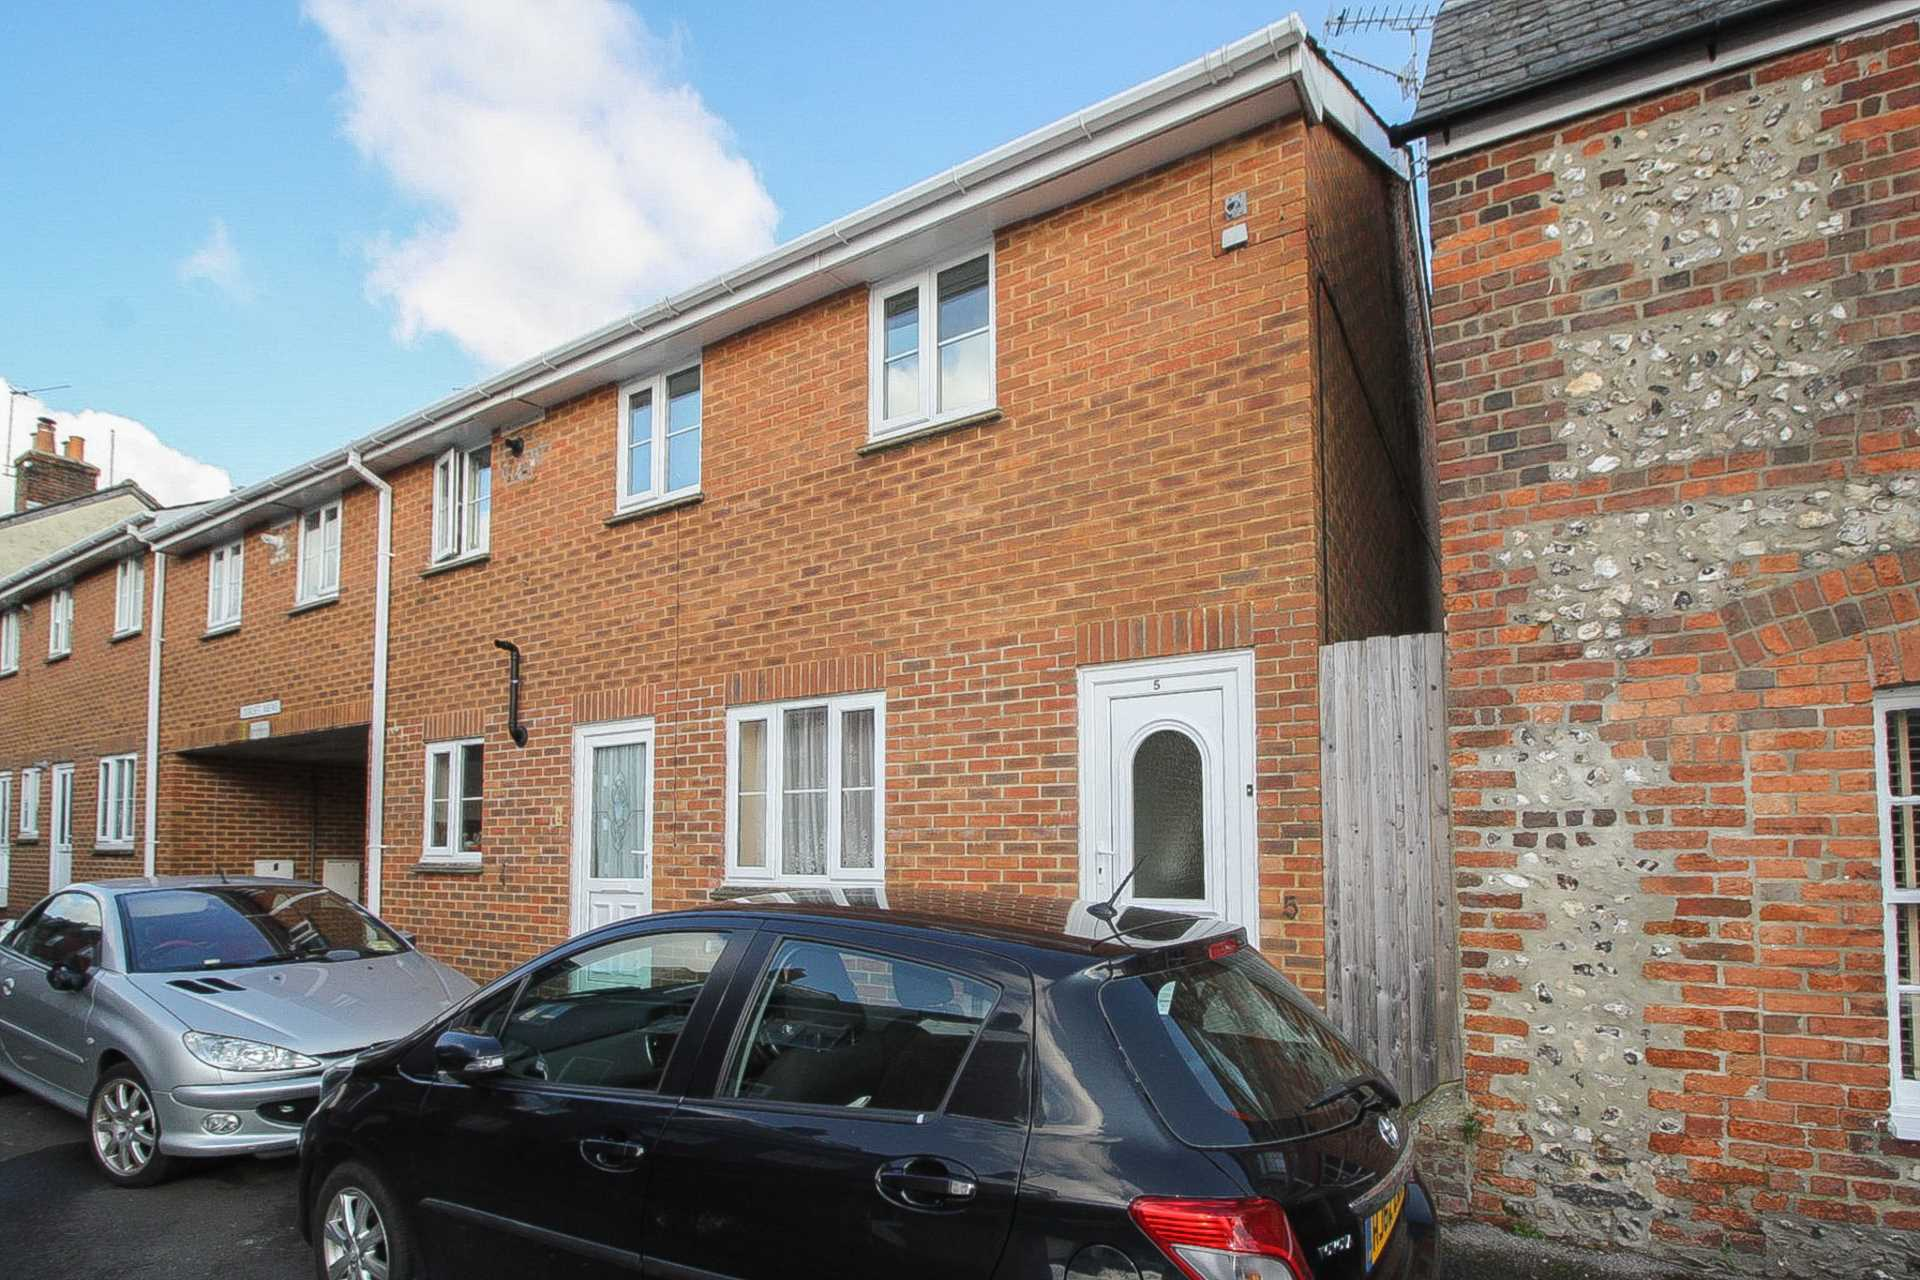 2 bed flat for sale in Dorset Mews, Dorset Street, Blandford Forum 0